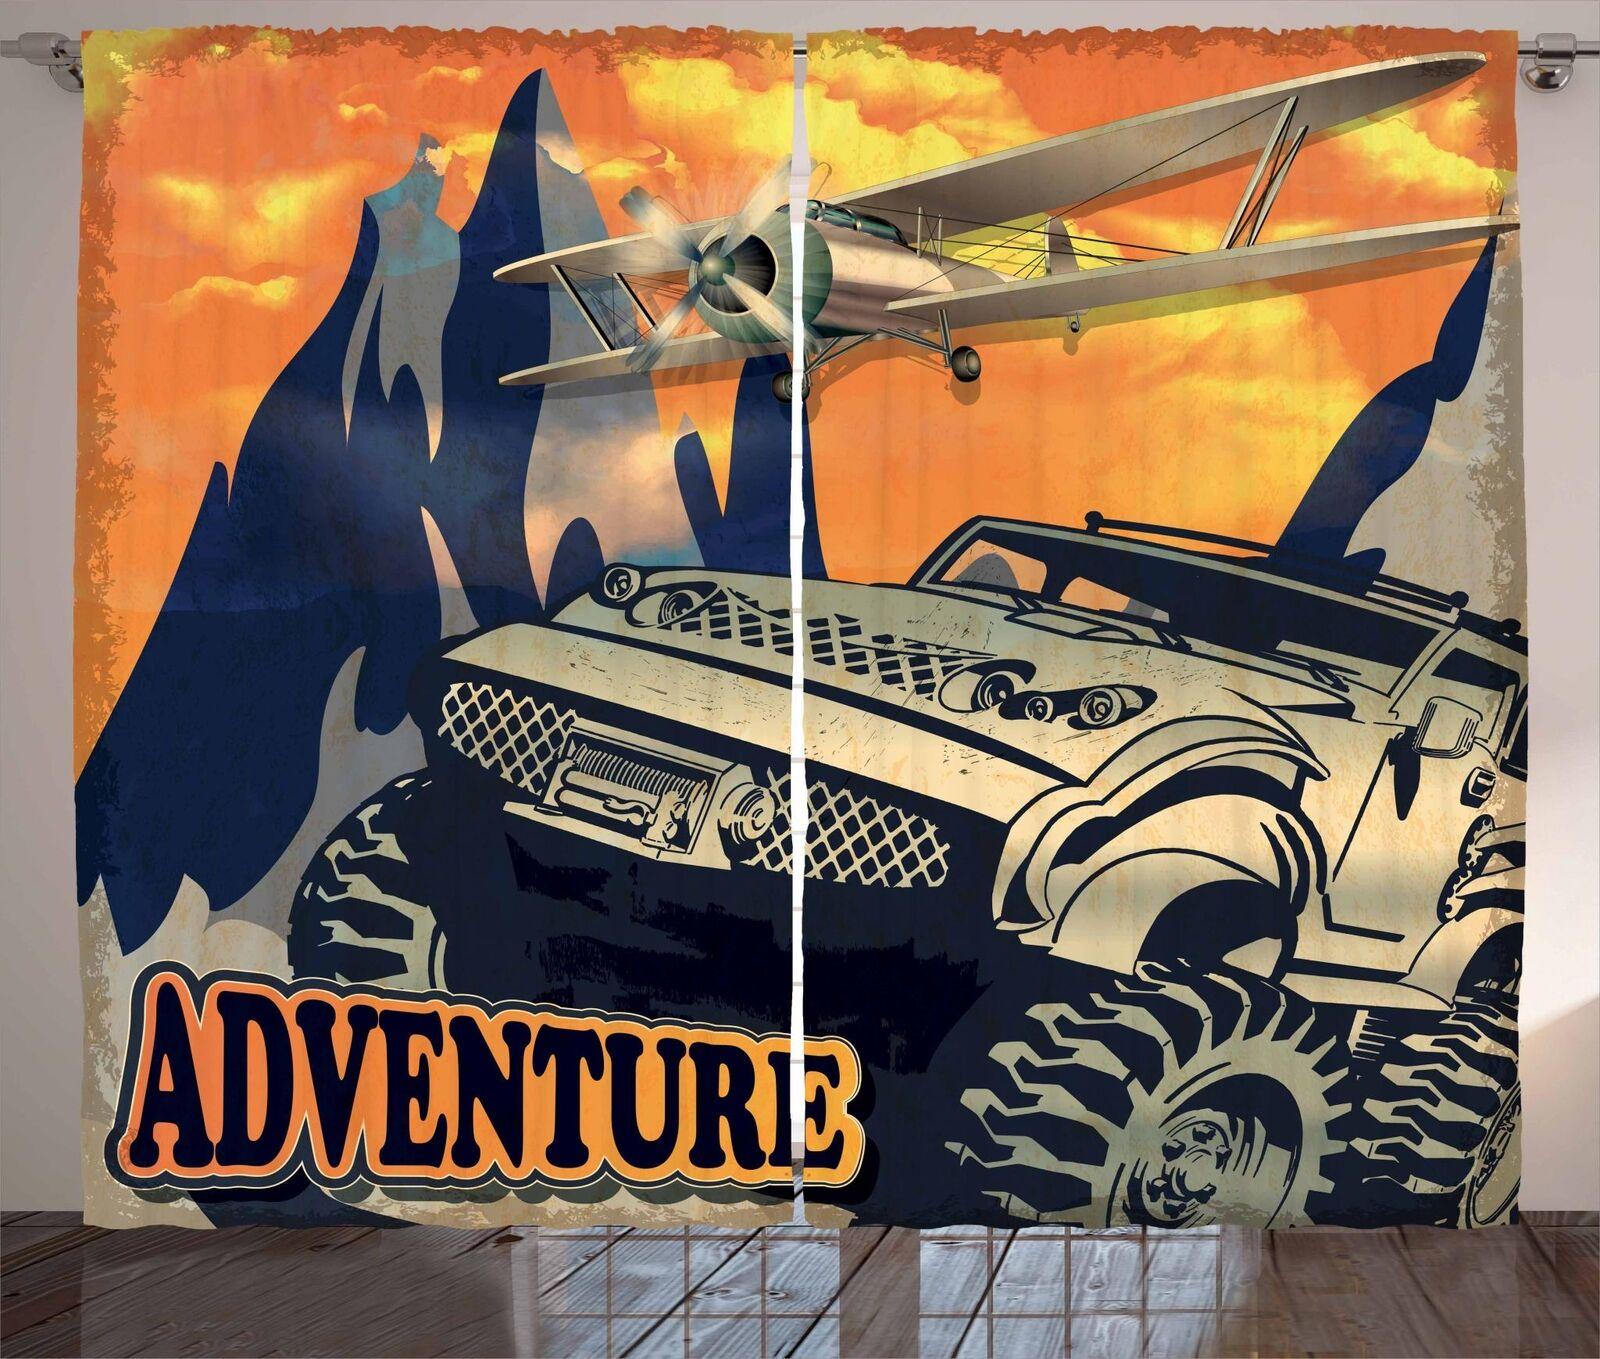 Adventure Adventure Adventure Saying Curtains 2 Panel Set for Decor 5 Größes Available Window Drapes 6f788d